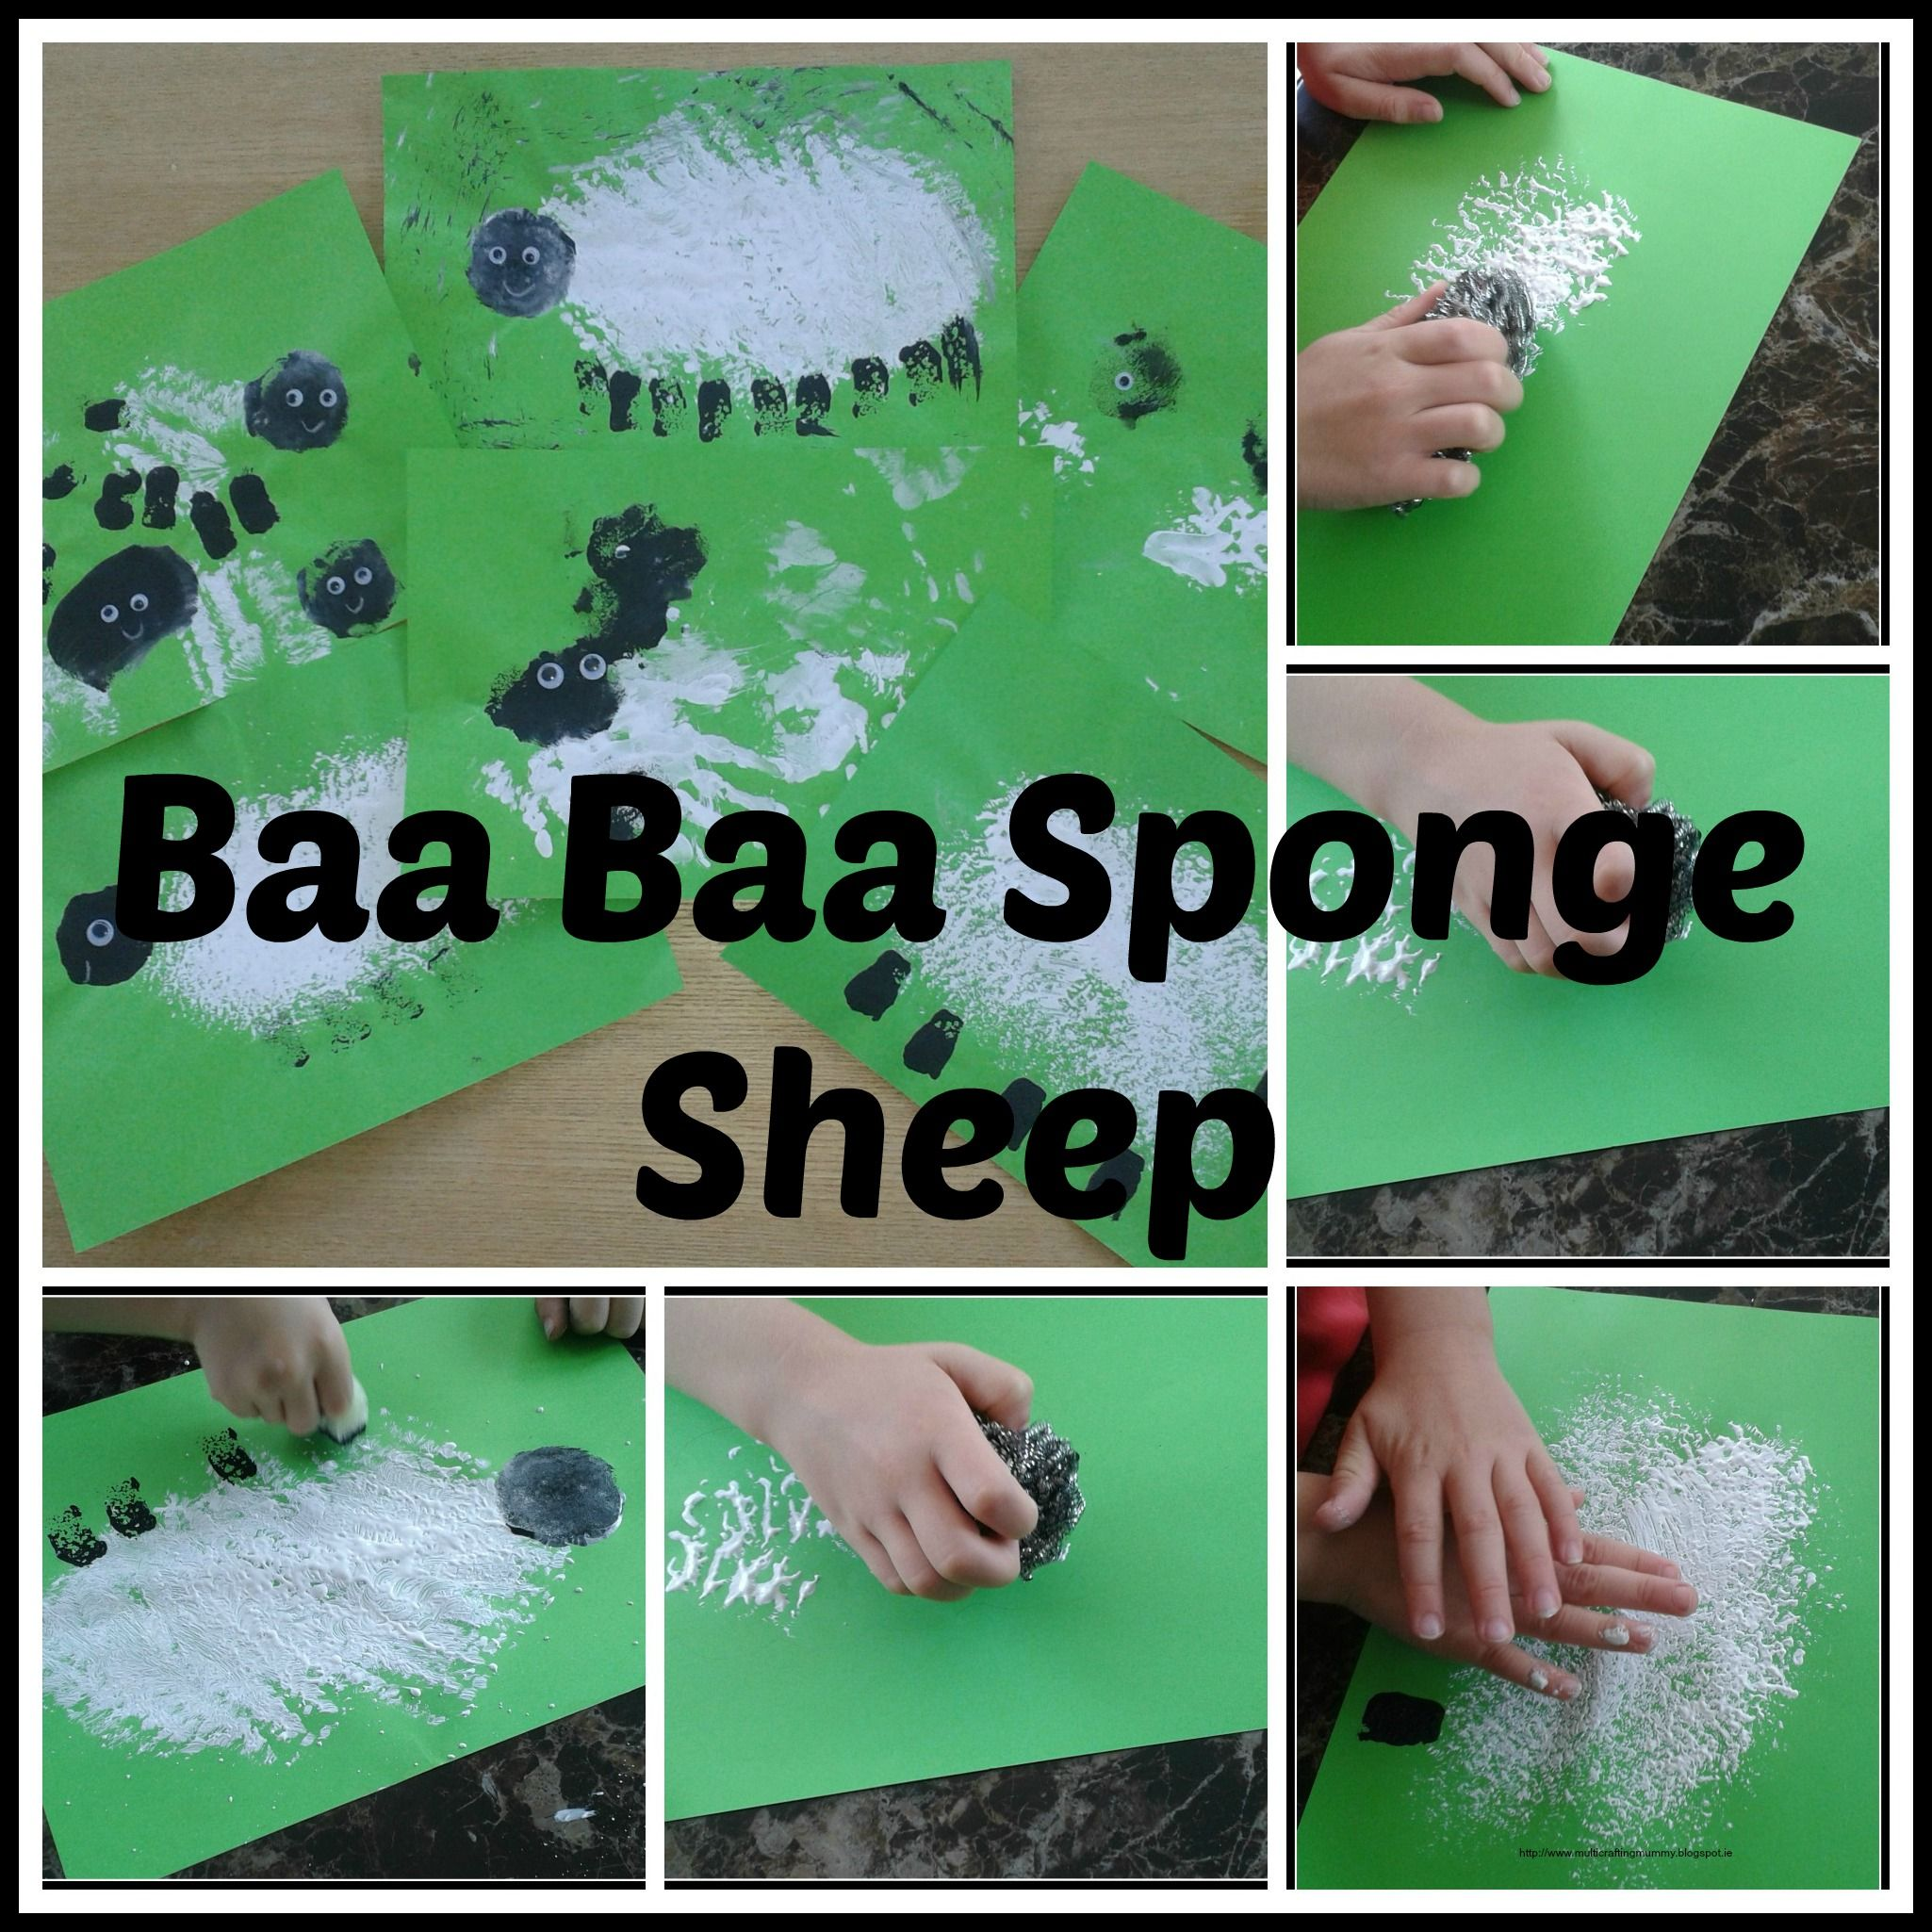 Baa Baa Sponge Painting Sheep | Paintings, Farming and Nursery